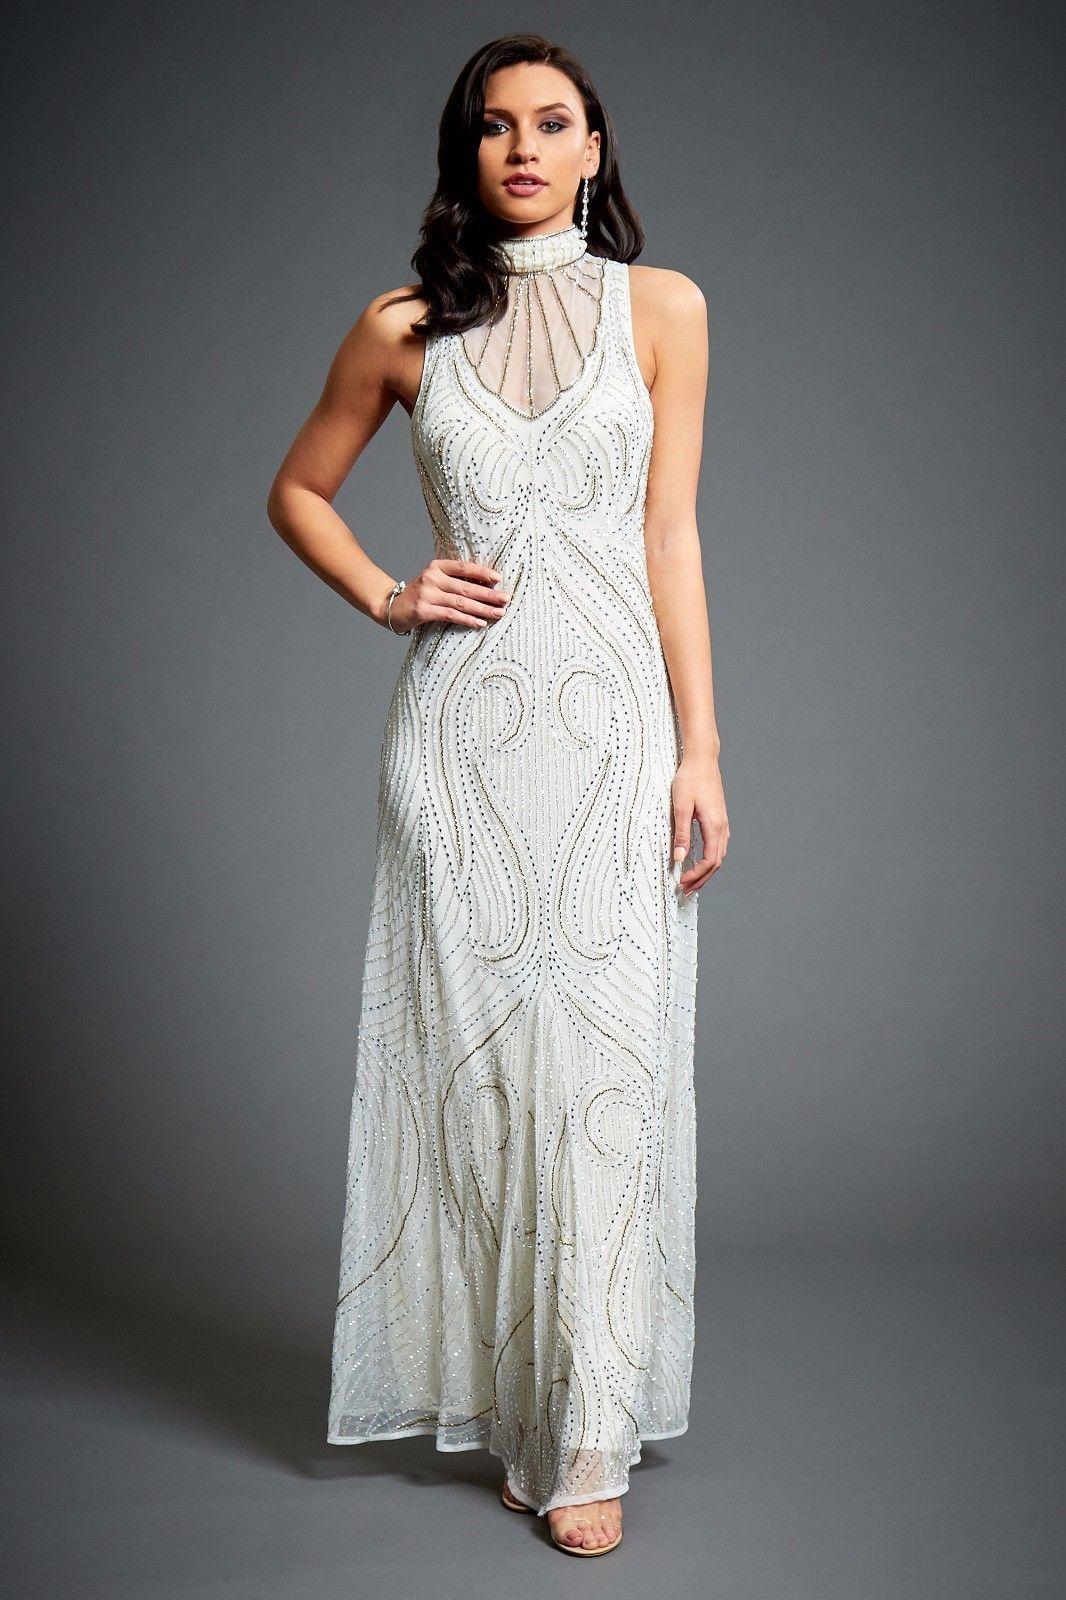 a44a46d20c0 Florence Art Deco 1920s Flapper Great Gatsby Style Wedding Guest Maxi Dress  10UK